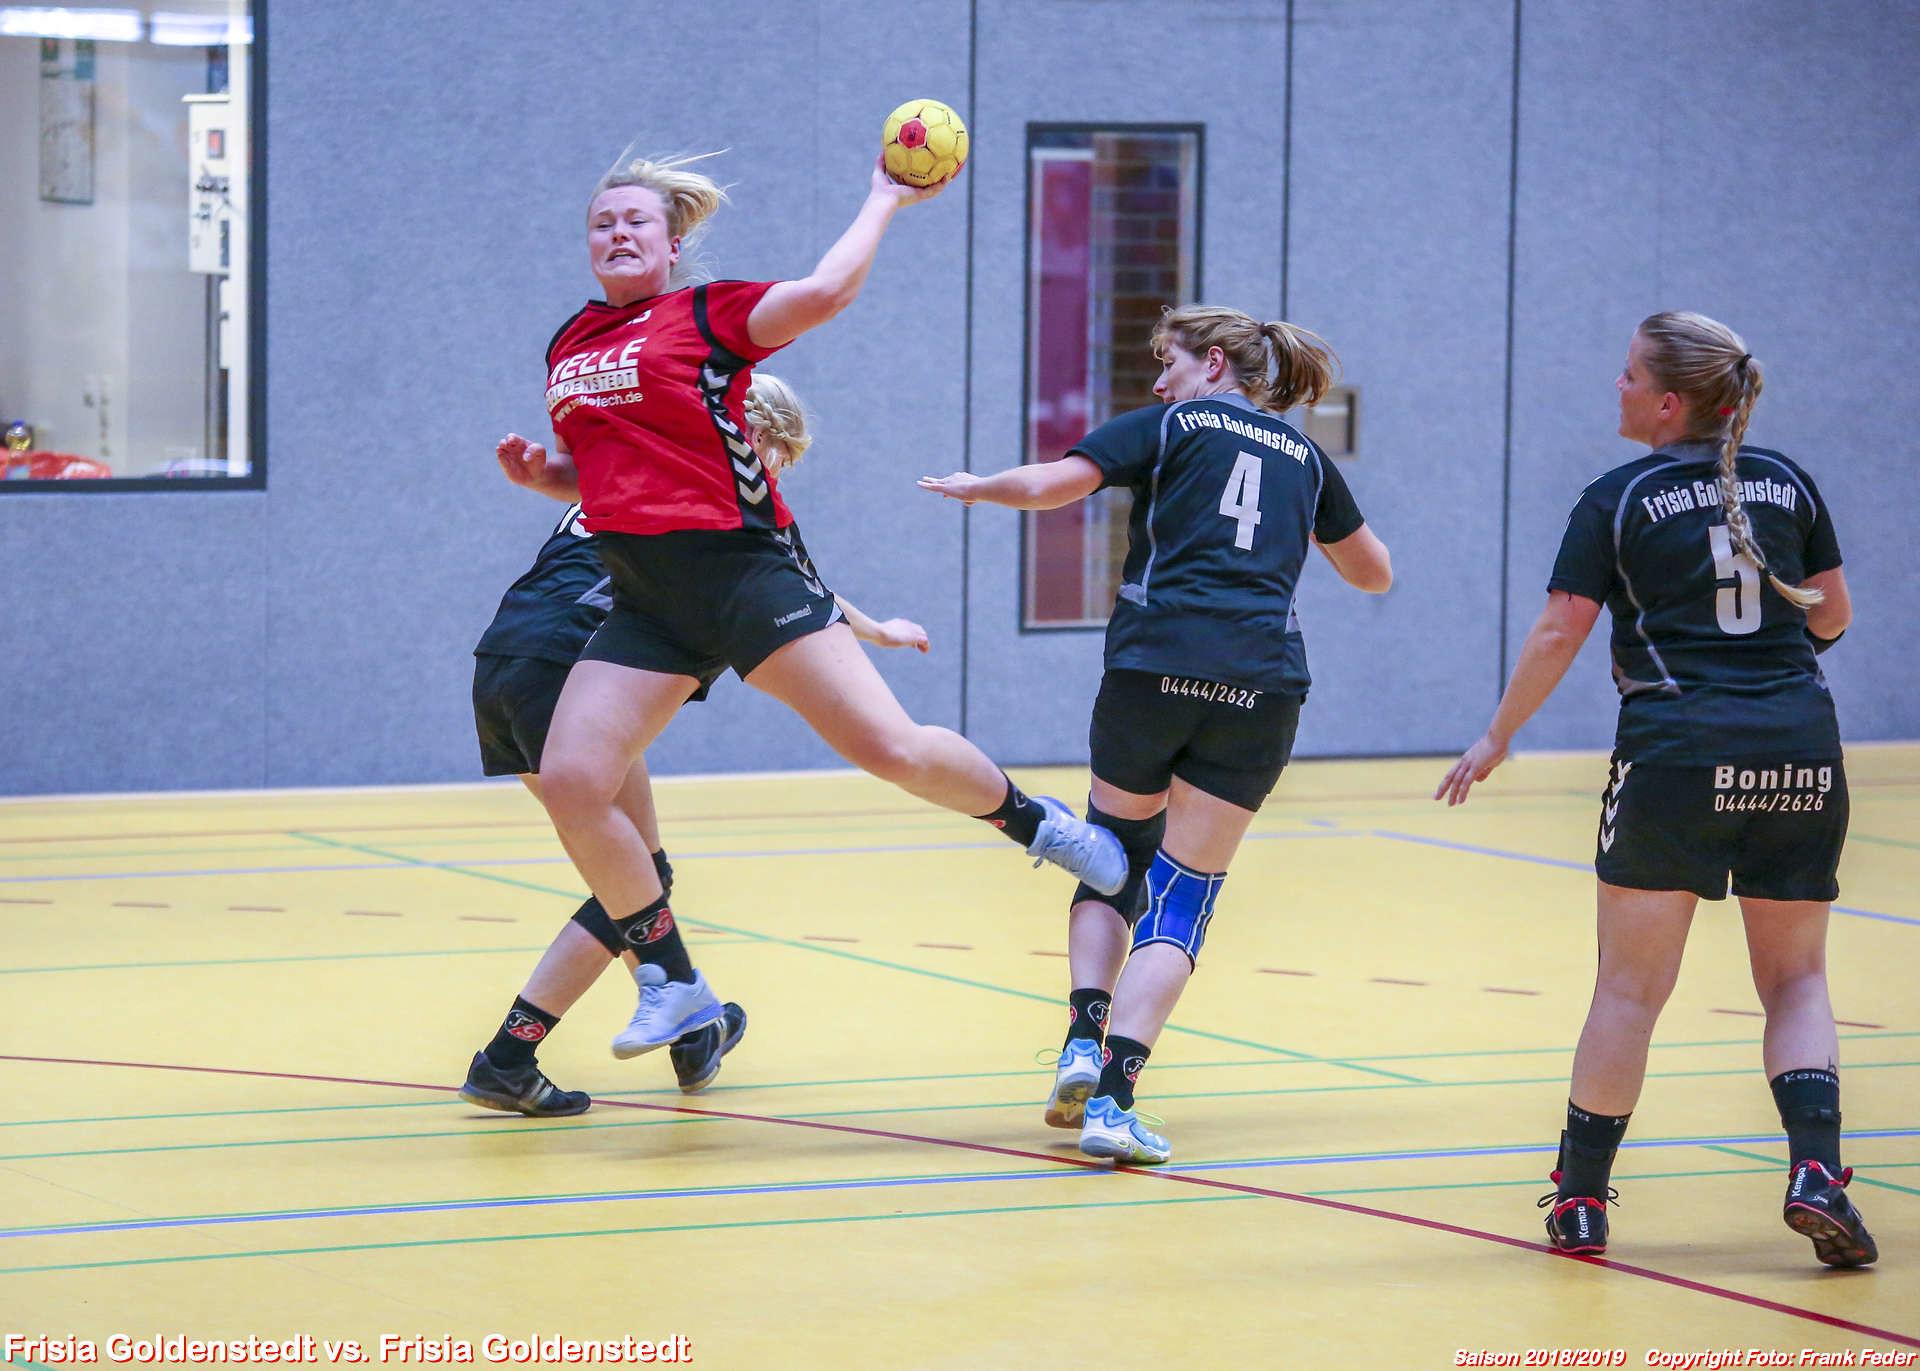 WEB_01-Frisia vs Frisia 2018_09_02_1659_030.jpg